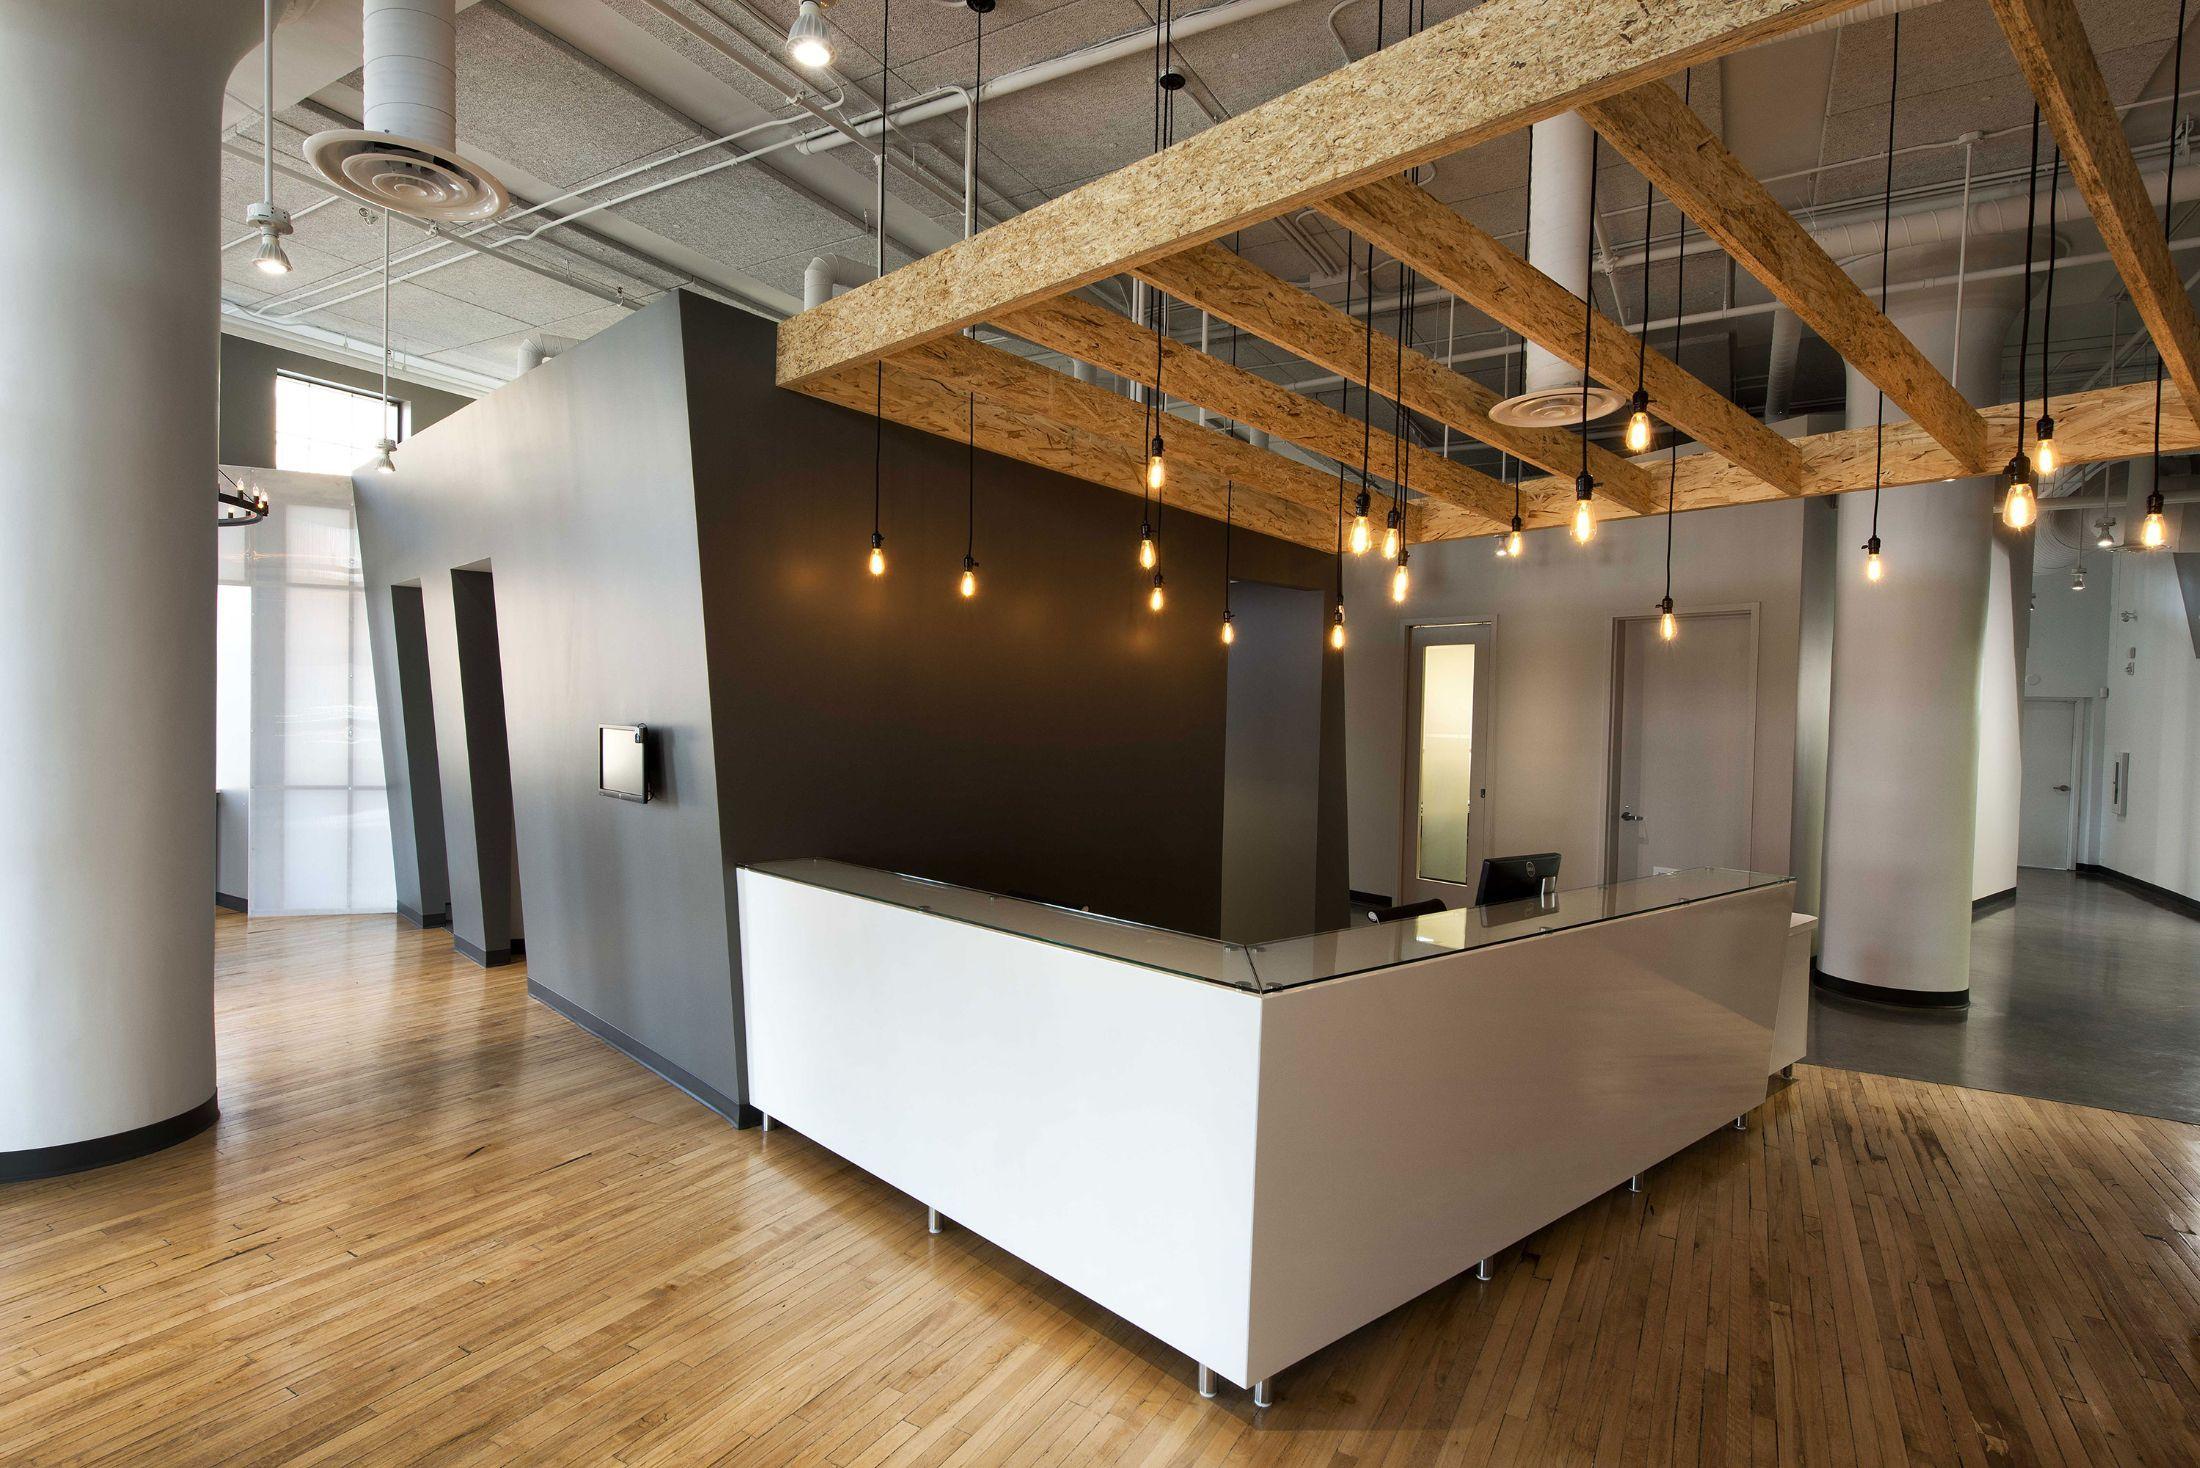 Uptown Orthodontics in 2020 Dental office design